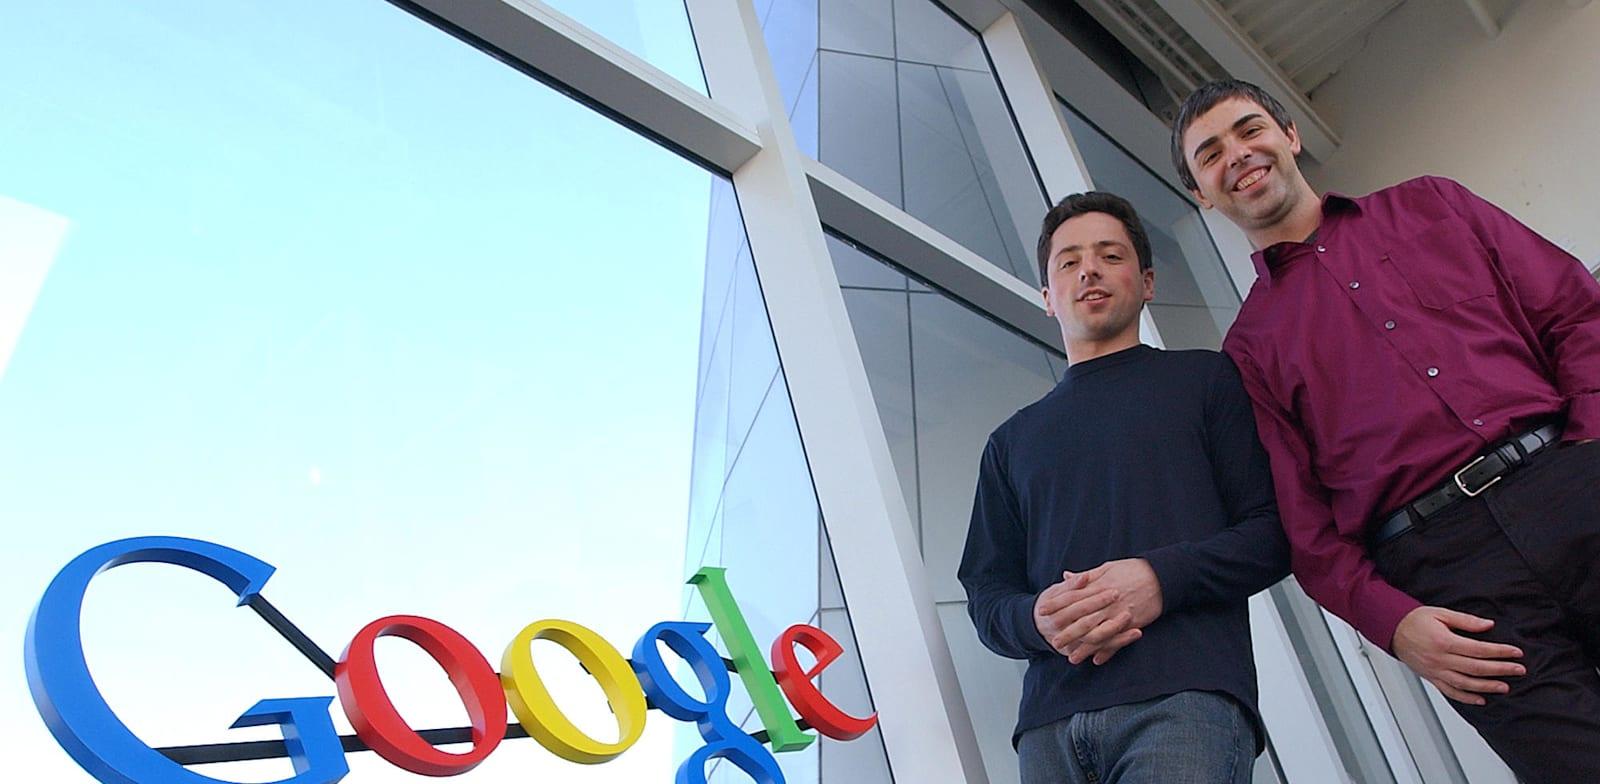 מייסדי גוגל, לארי פייג' וסרגיי ברין / צילום: ben margot